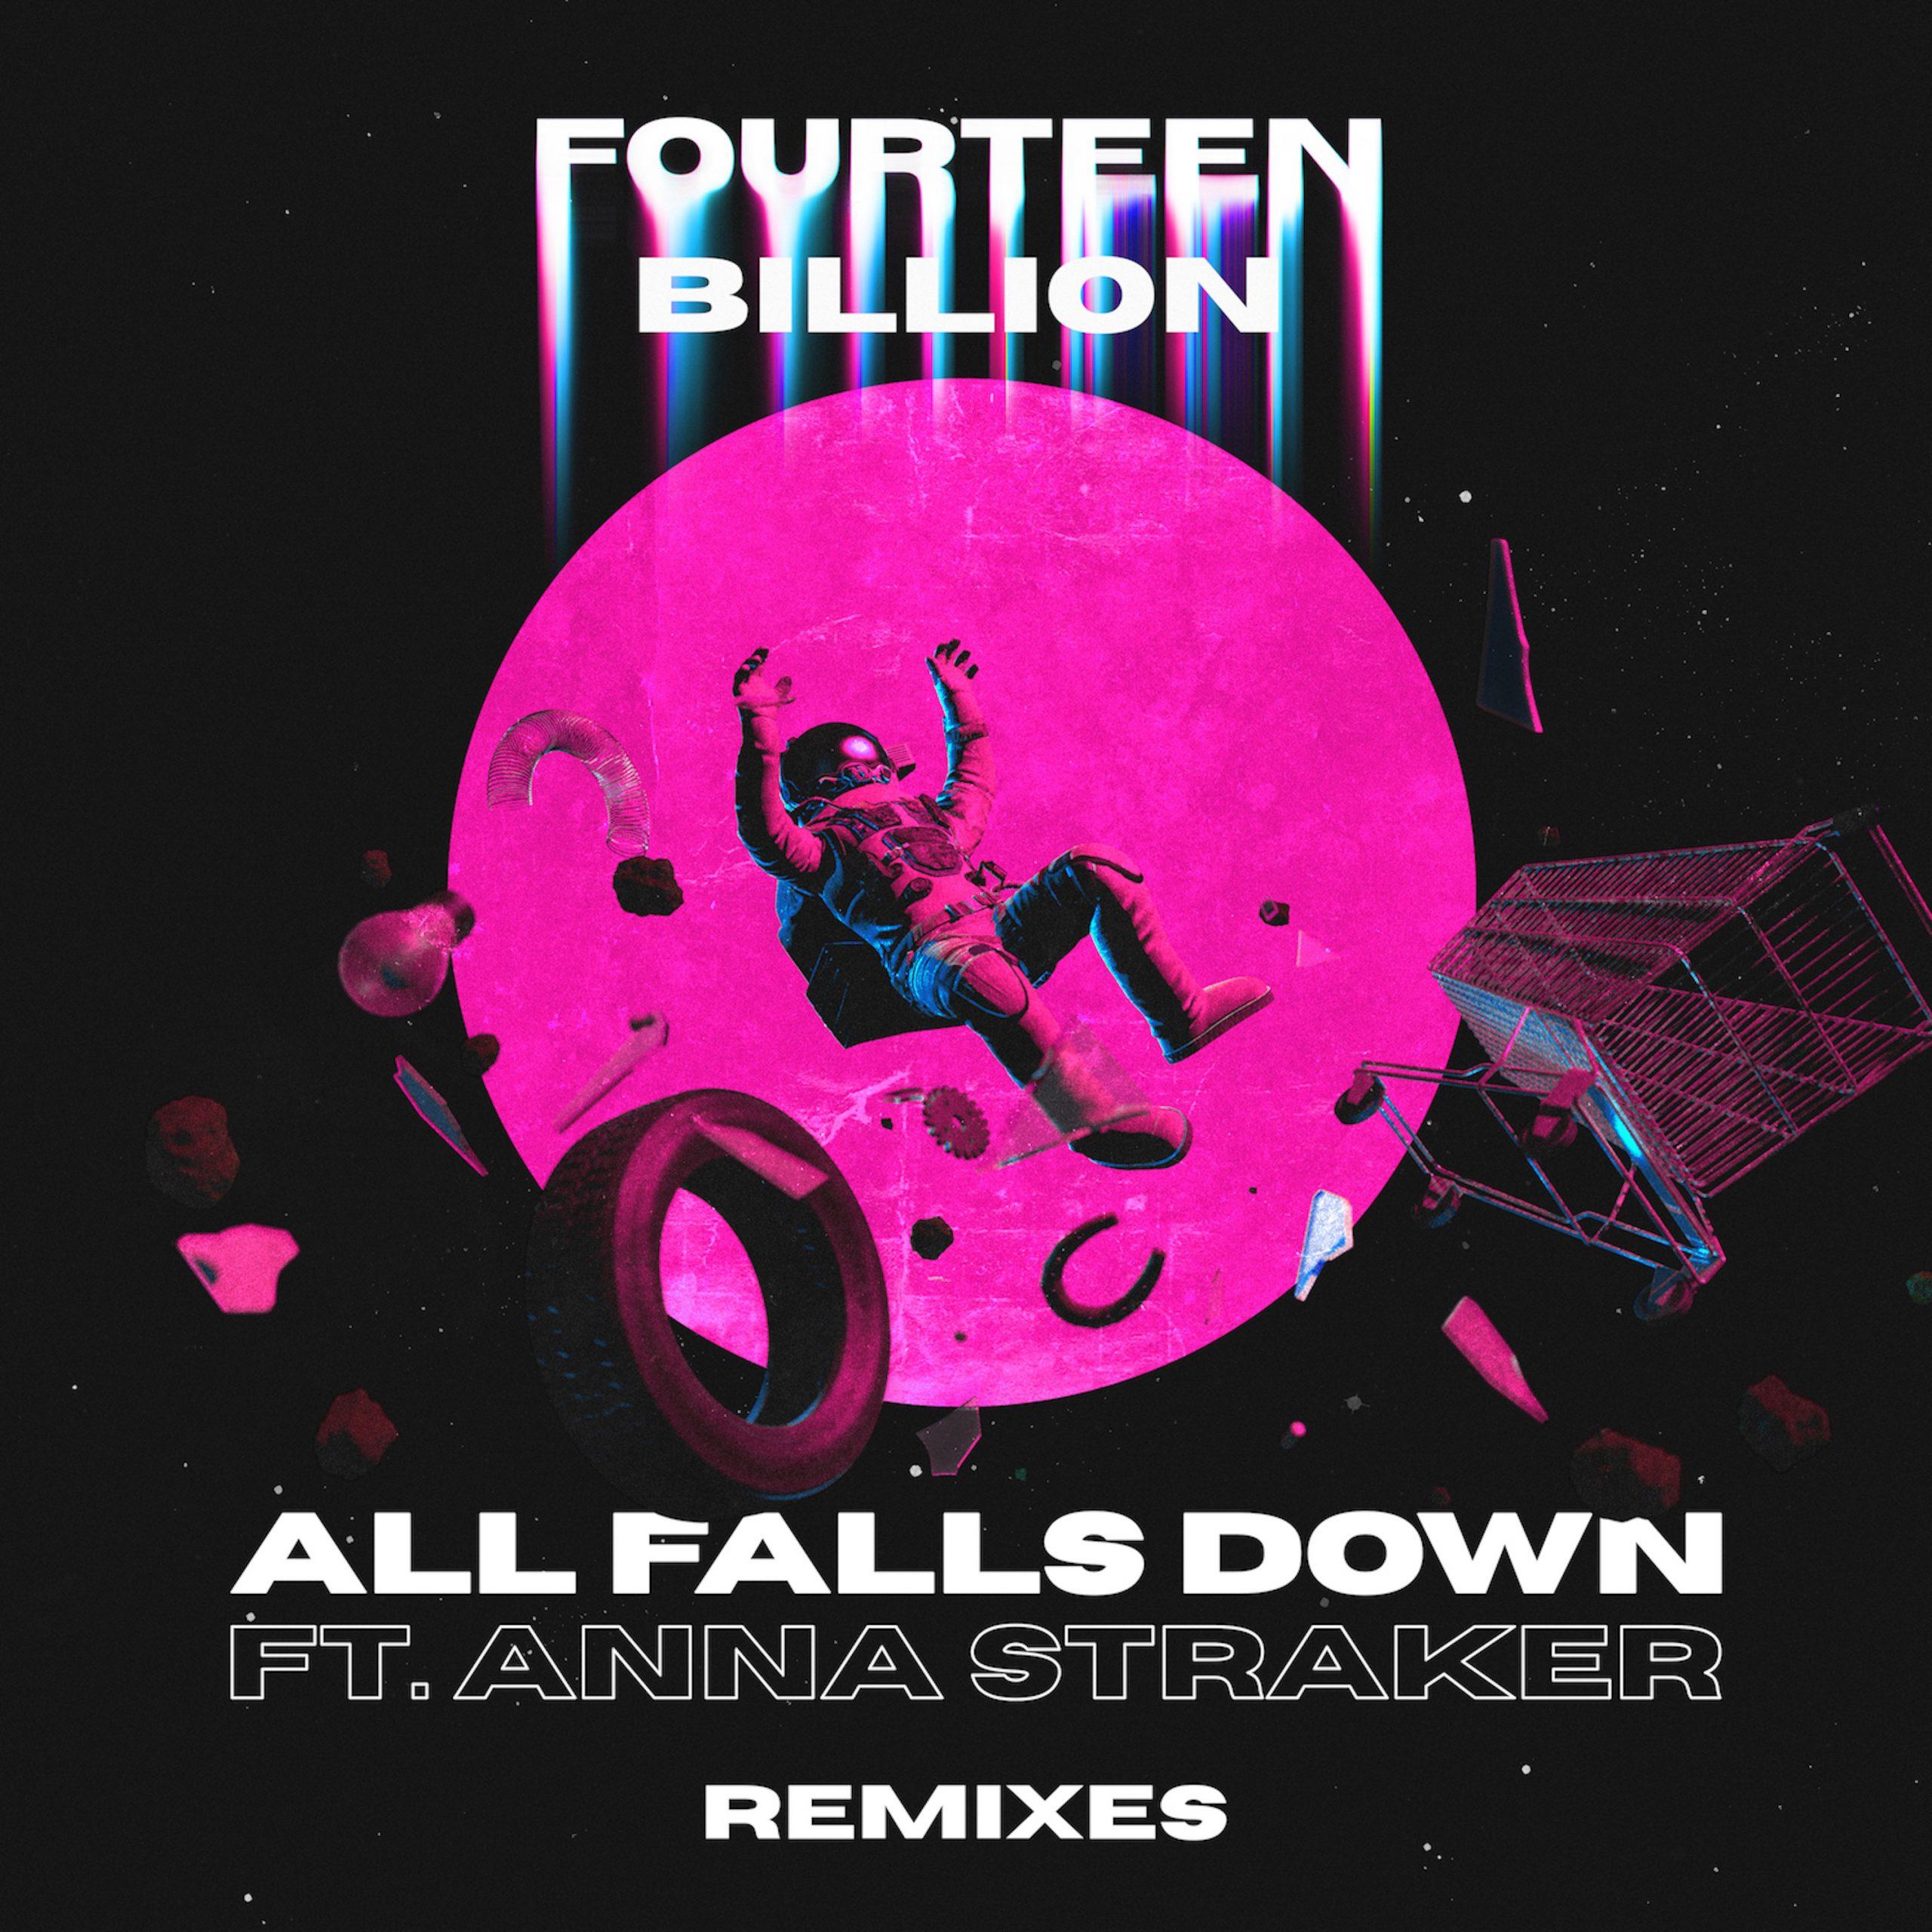 Kokiri, EMBERS and Dani Calvo remix fourteenbillion. and Anna Straker collab  'All Falls Down' – Music is 4 Lovers